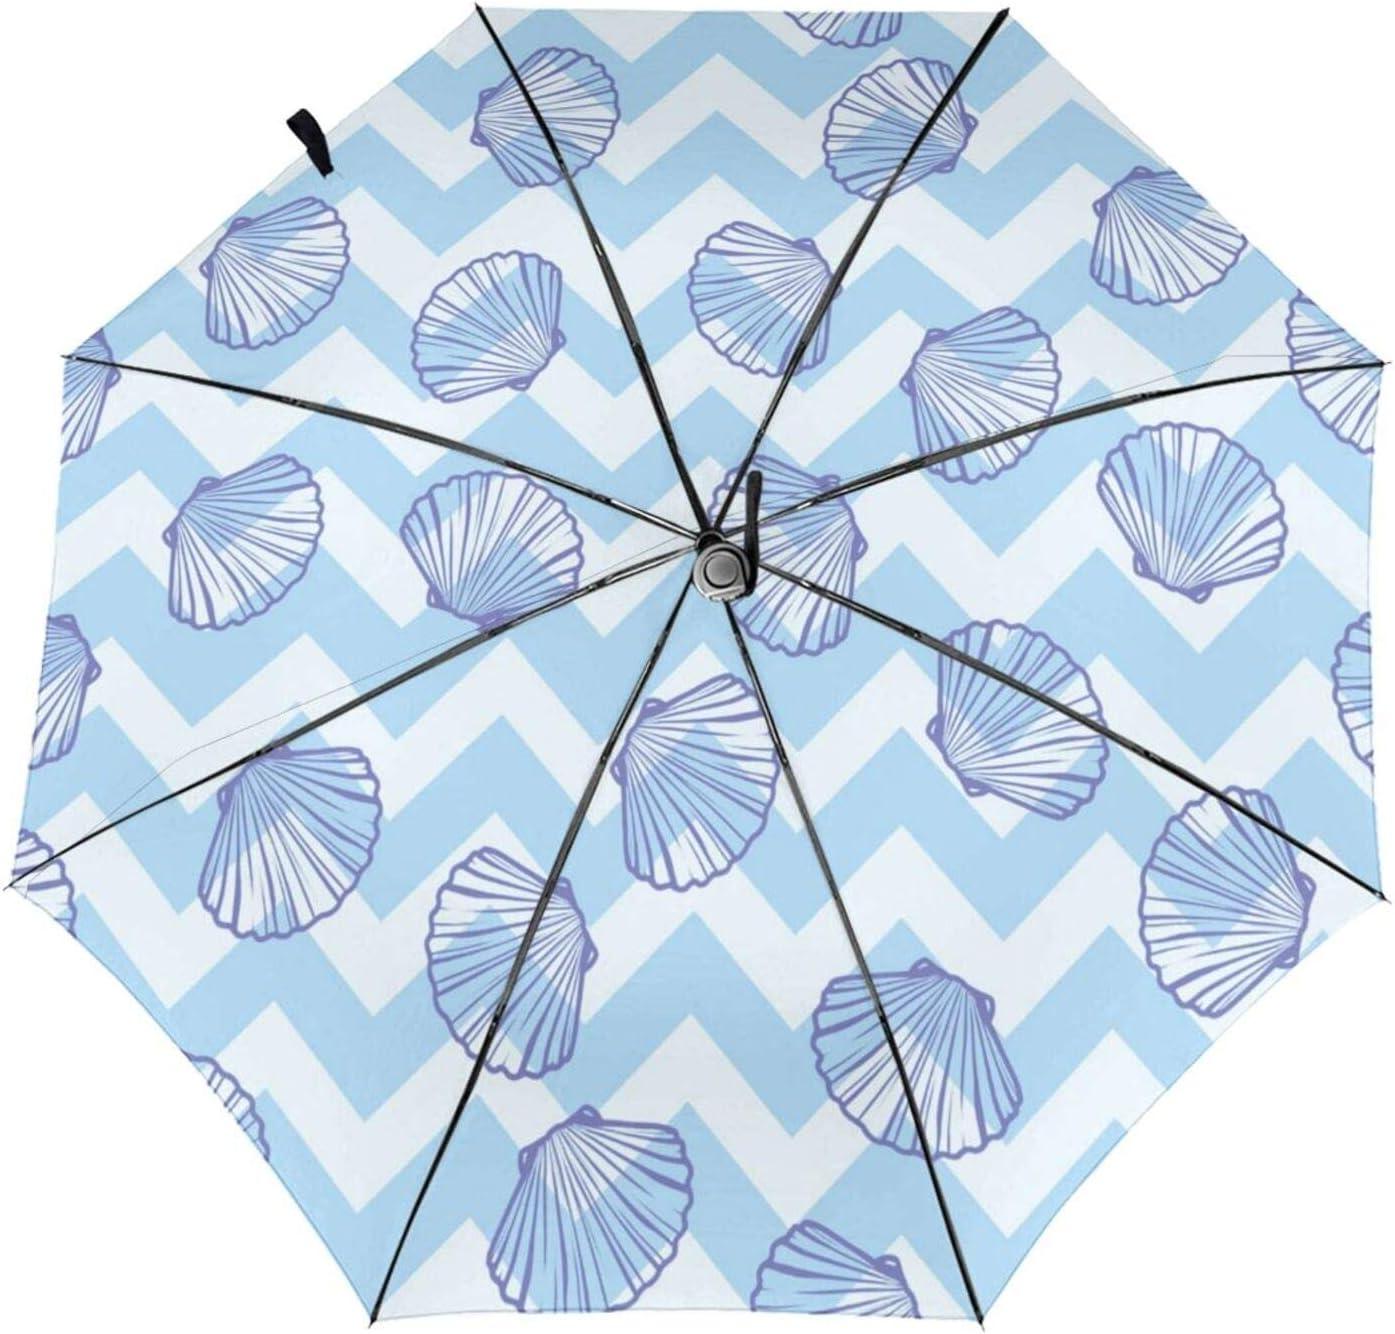 zsst Automatic Folding Umbrellas Inside S Daily bargain sale Seashells Print Marine Max 46% OFF